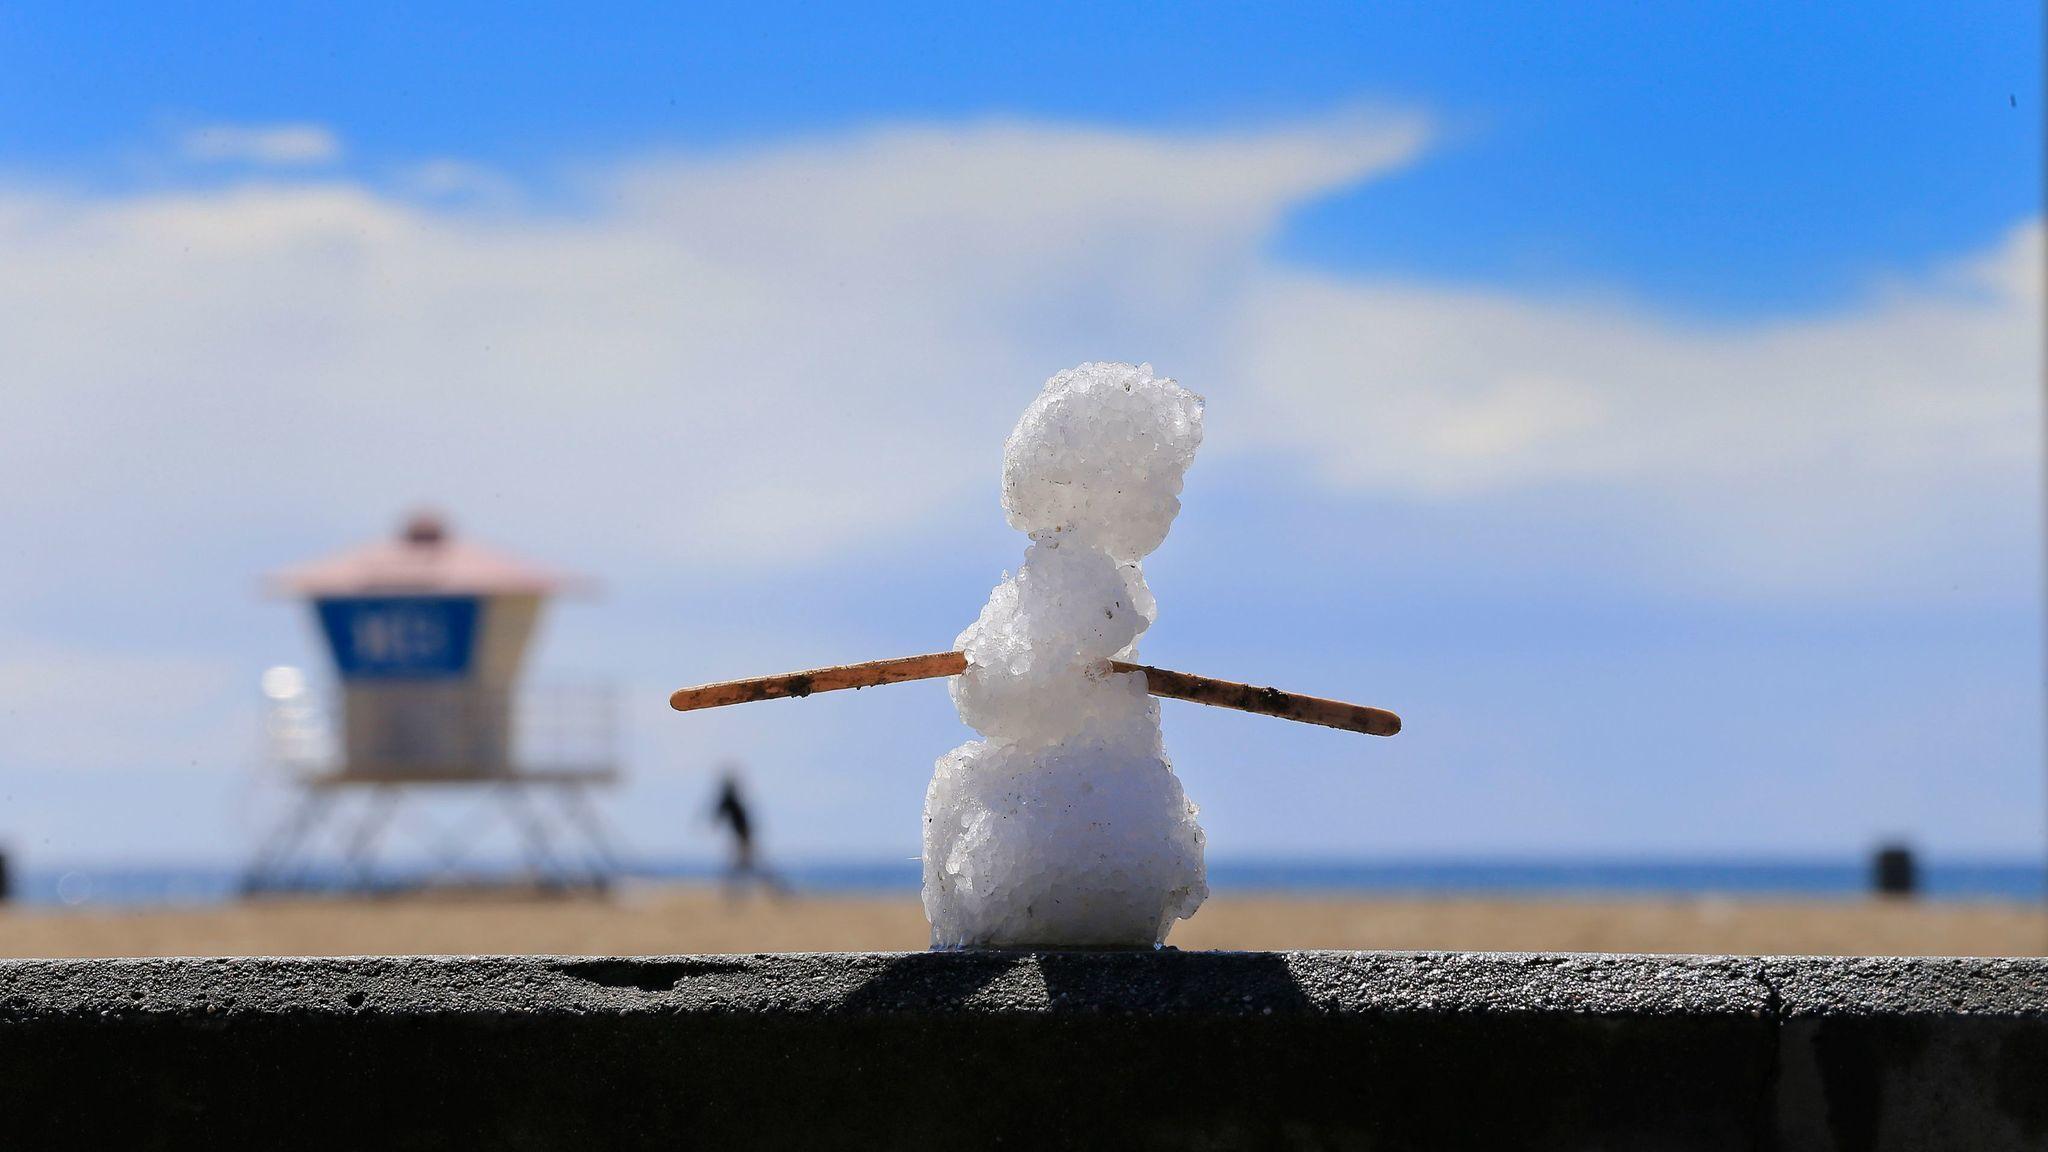 HUNTINGTON BEACH, CA MARCH 2, 2015: A snowman made of hail stands amid a rare sight of a blanket o